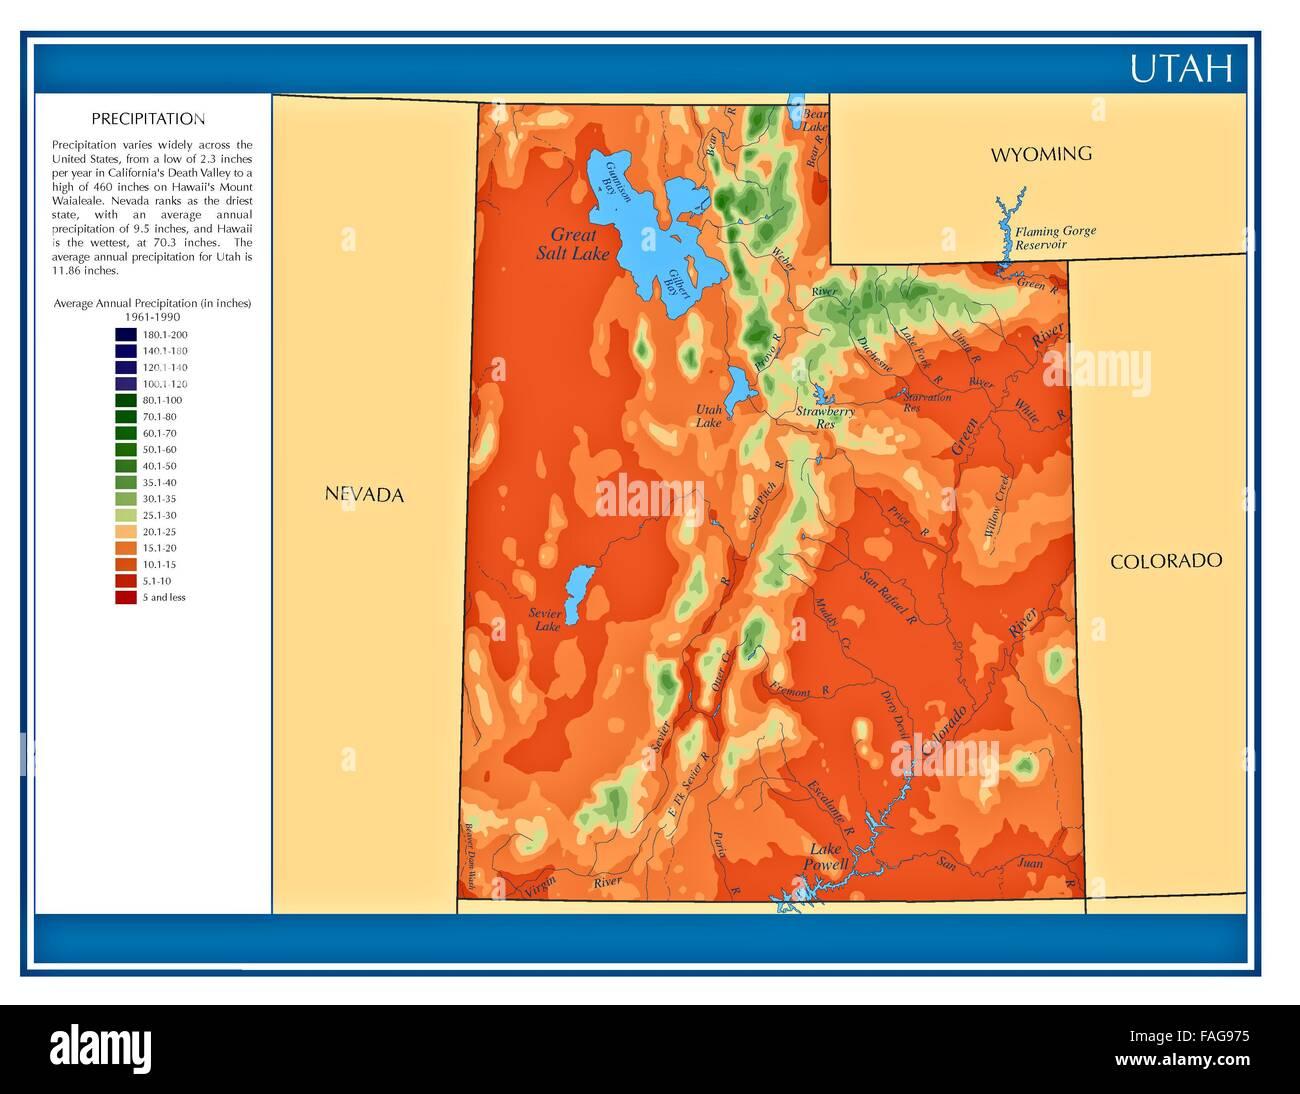 Utah United States Water Precipitation Statistics Map By